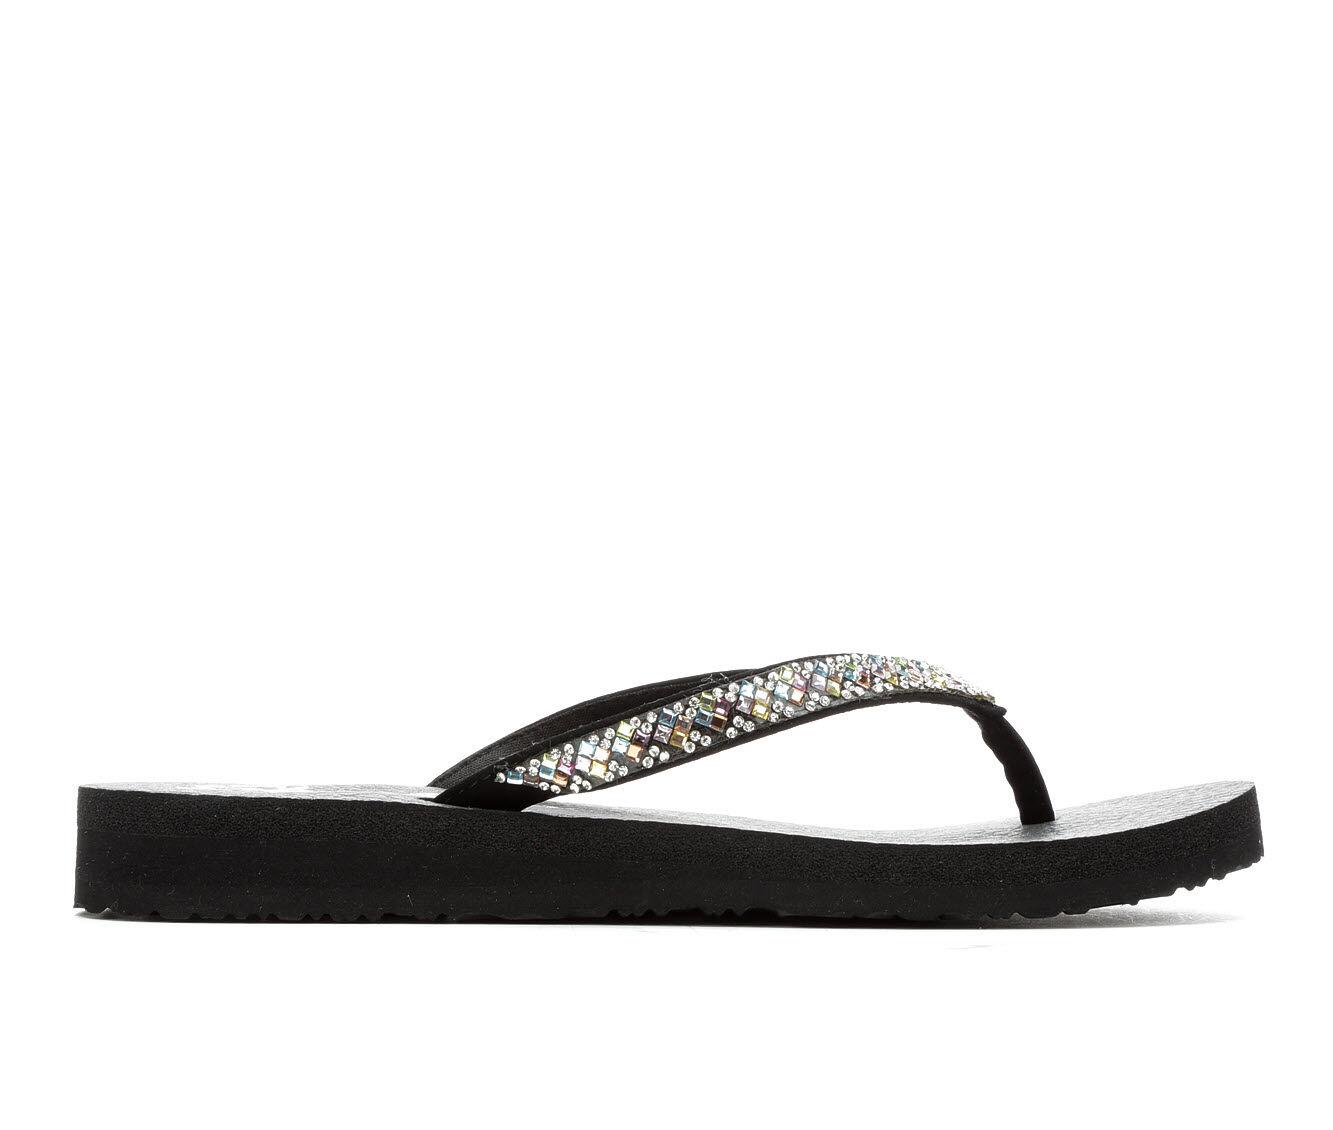 Women's Skechers Cali Perfect 10 31756 Sandals Black Multi